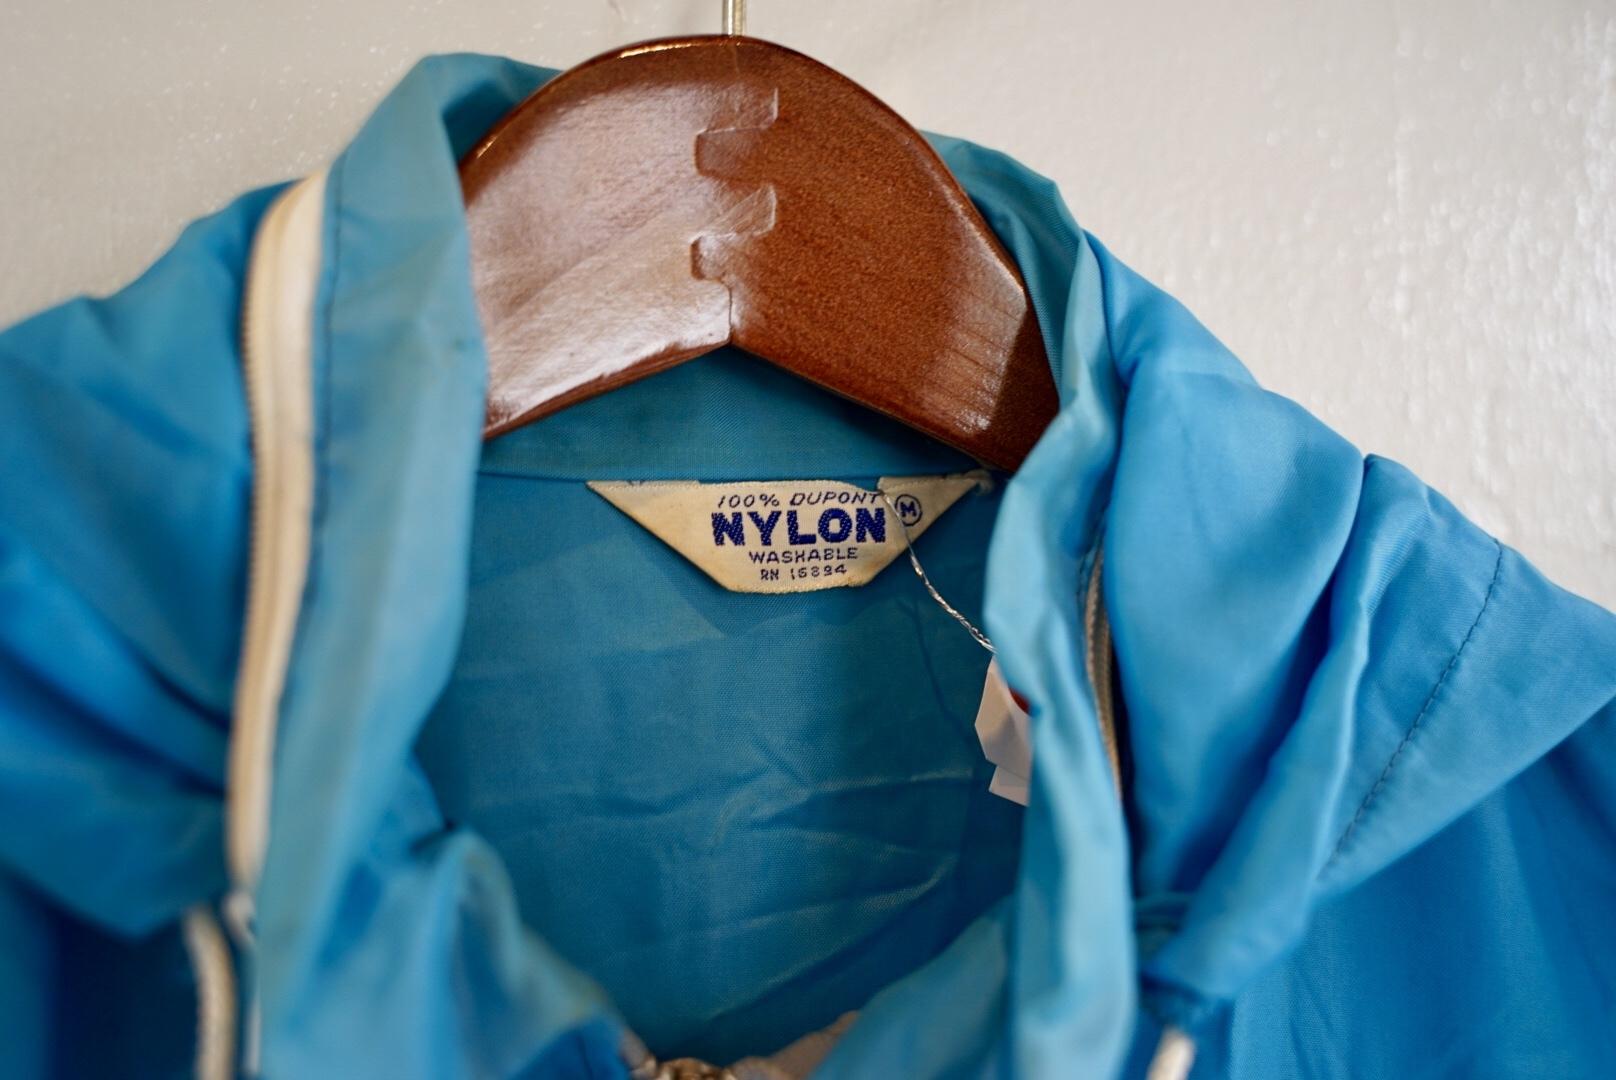 NYLON ナイロンジャケット